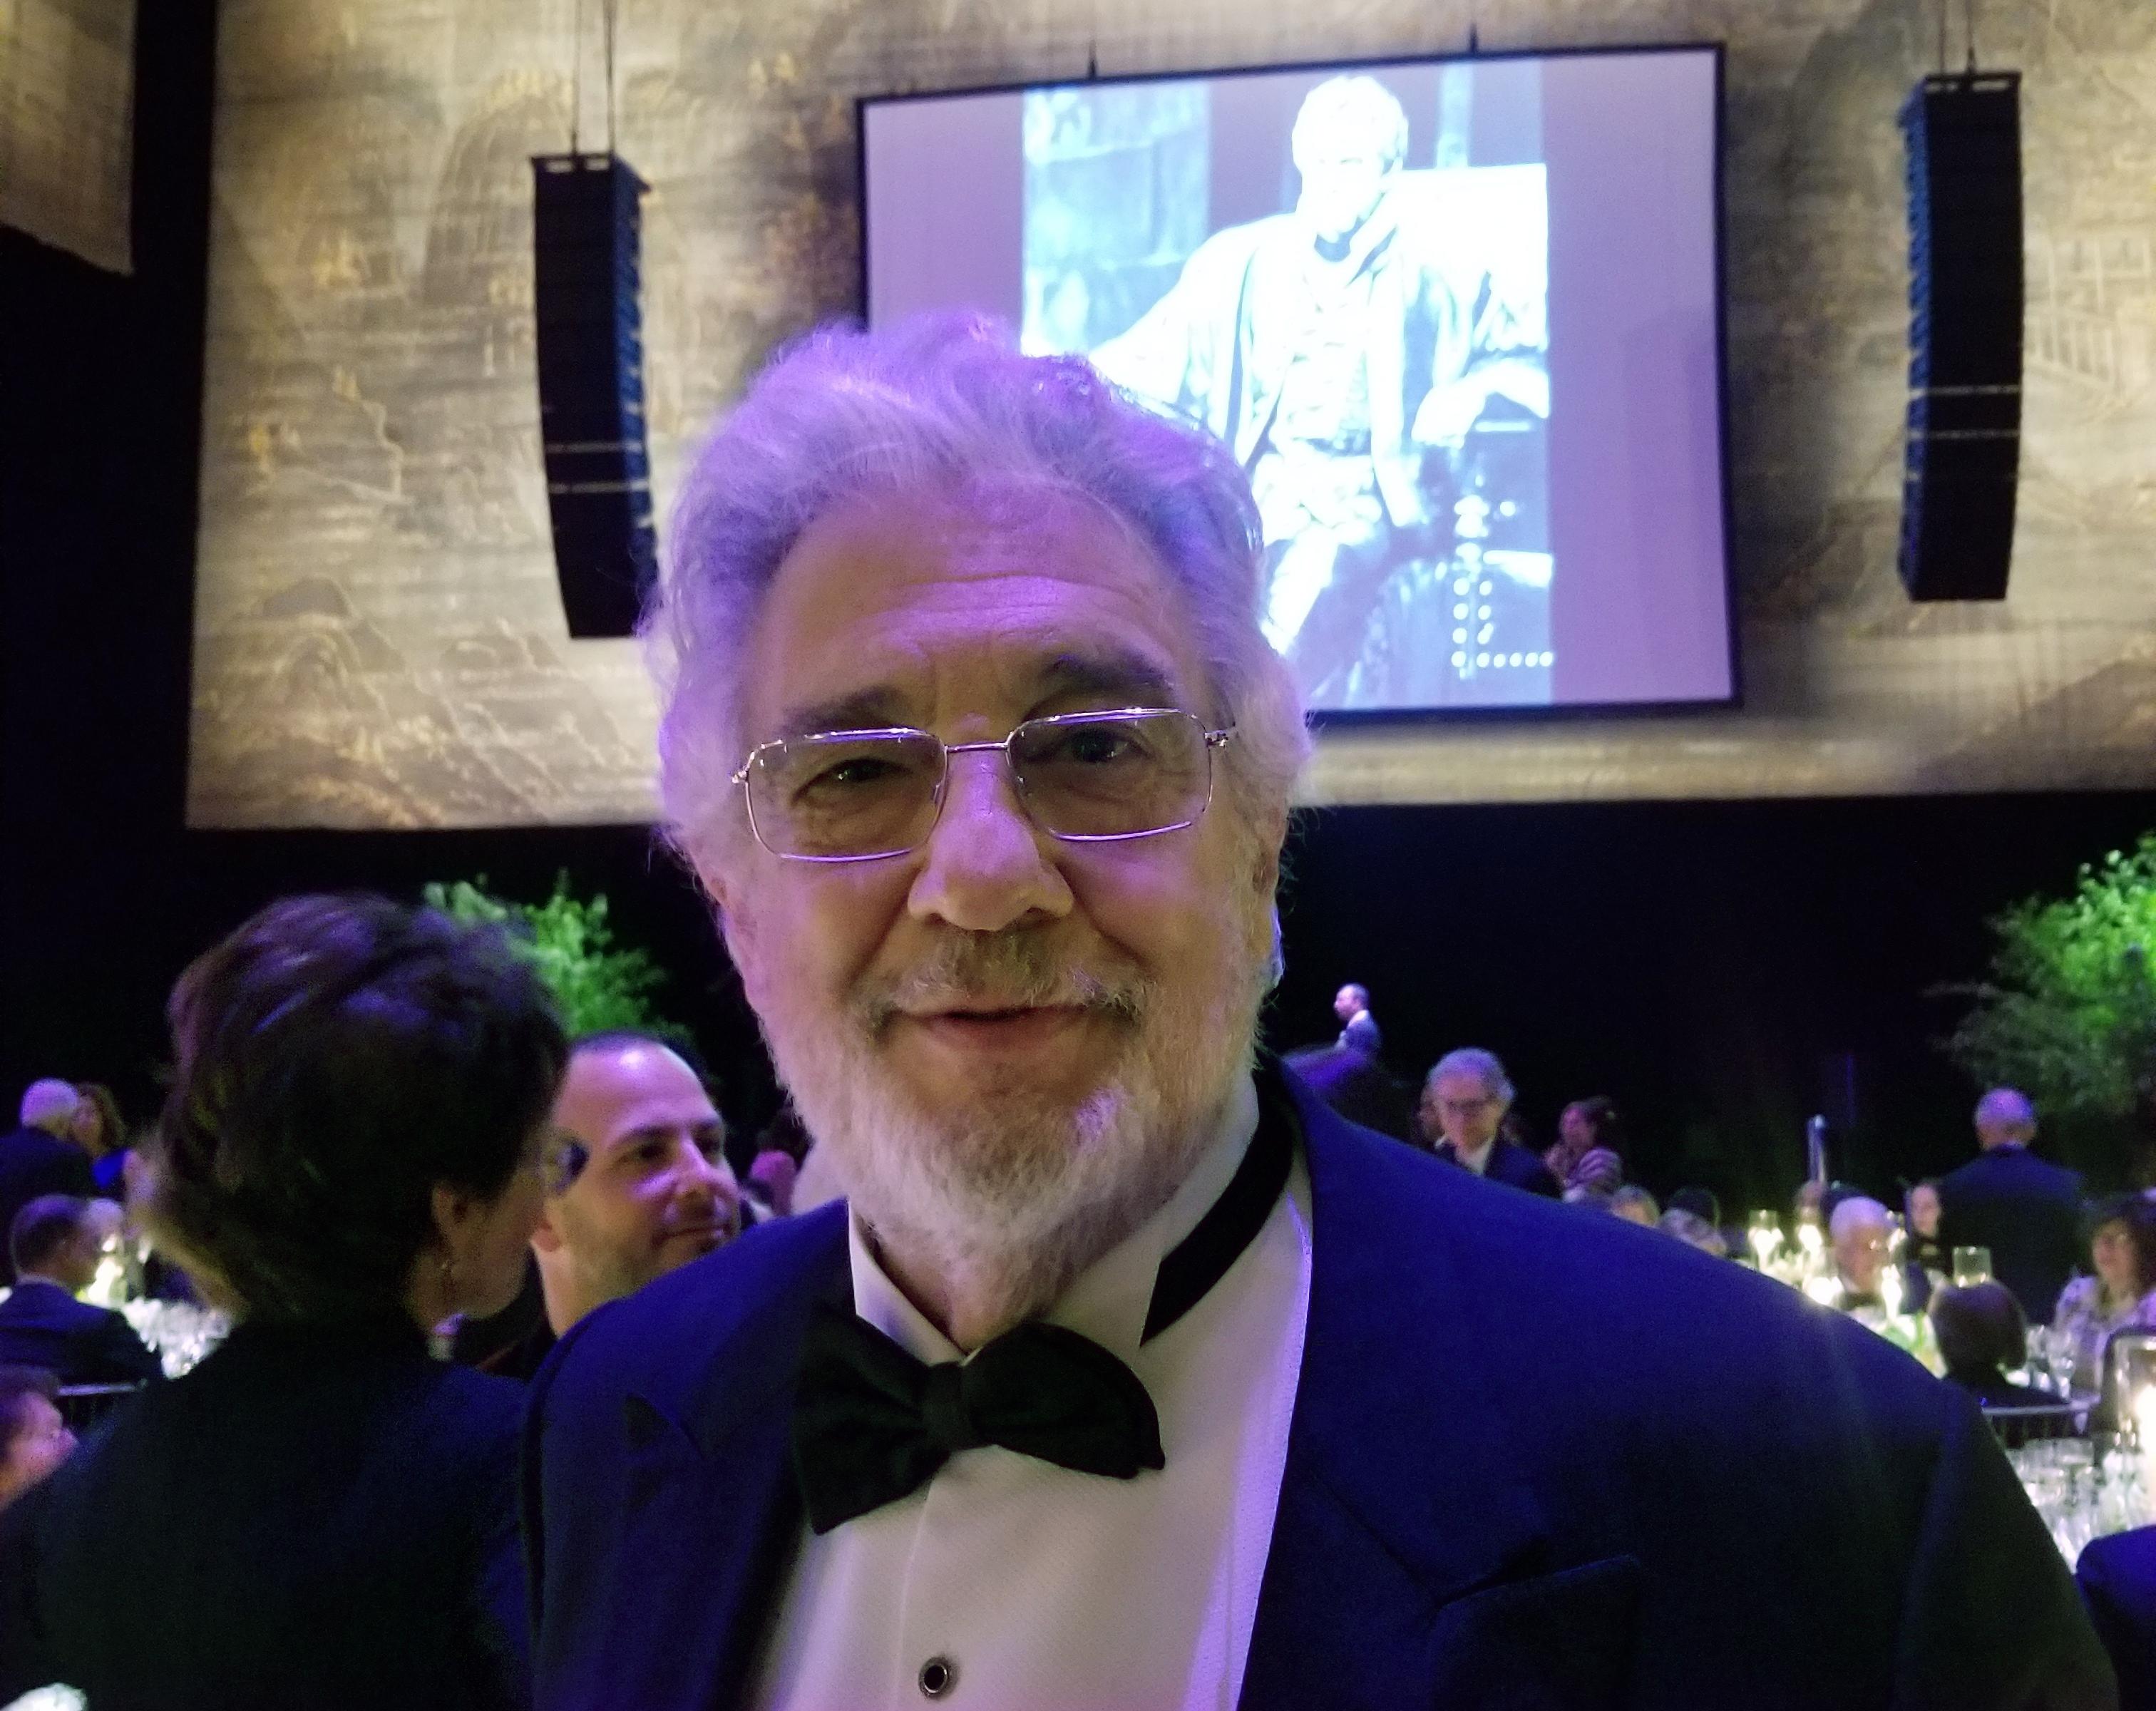 Metropolitan Opera fetes Placido Domingo golden anniversary